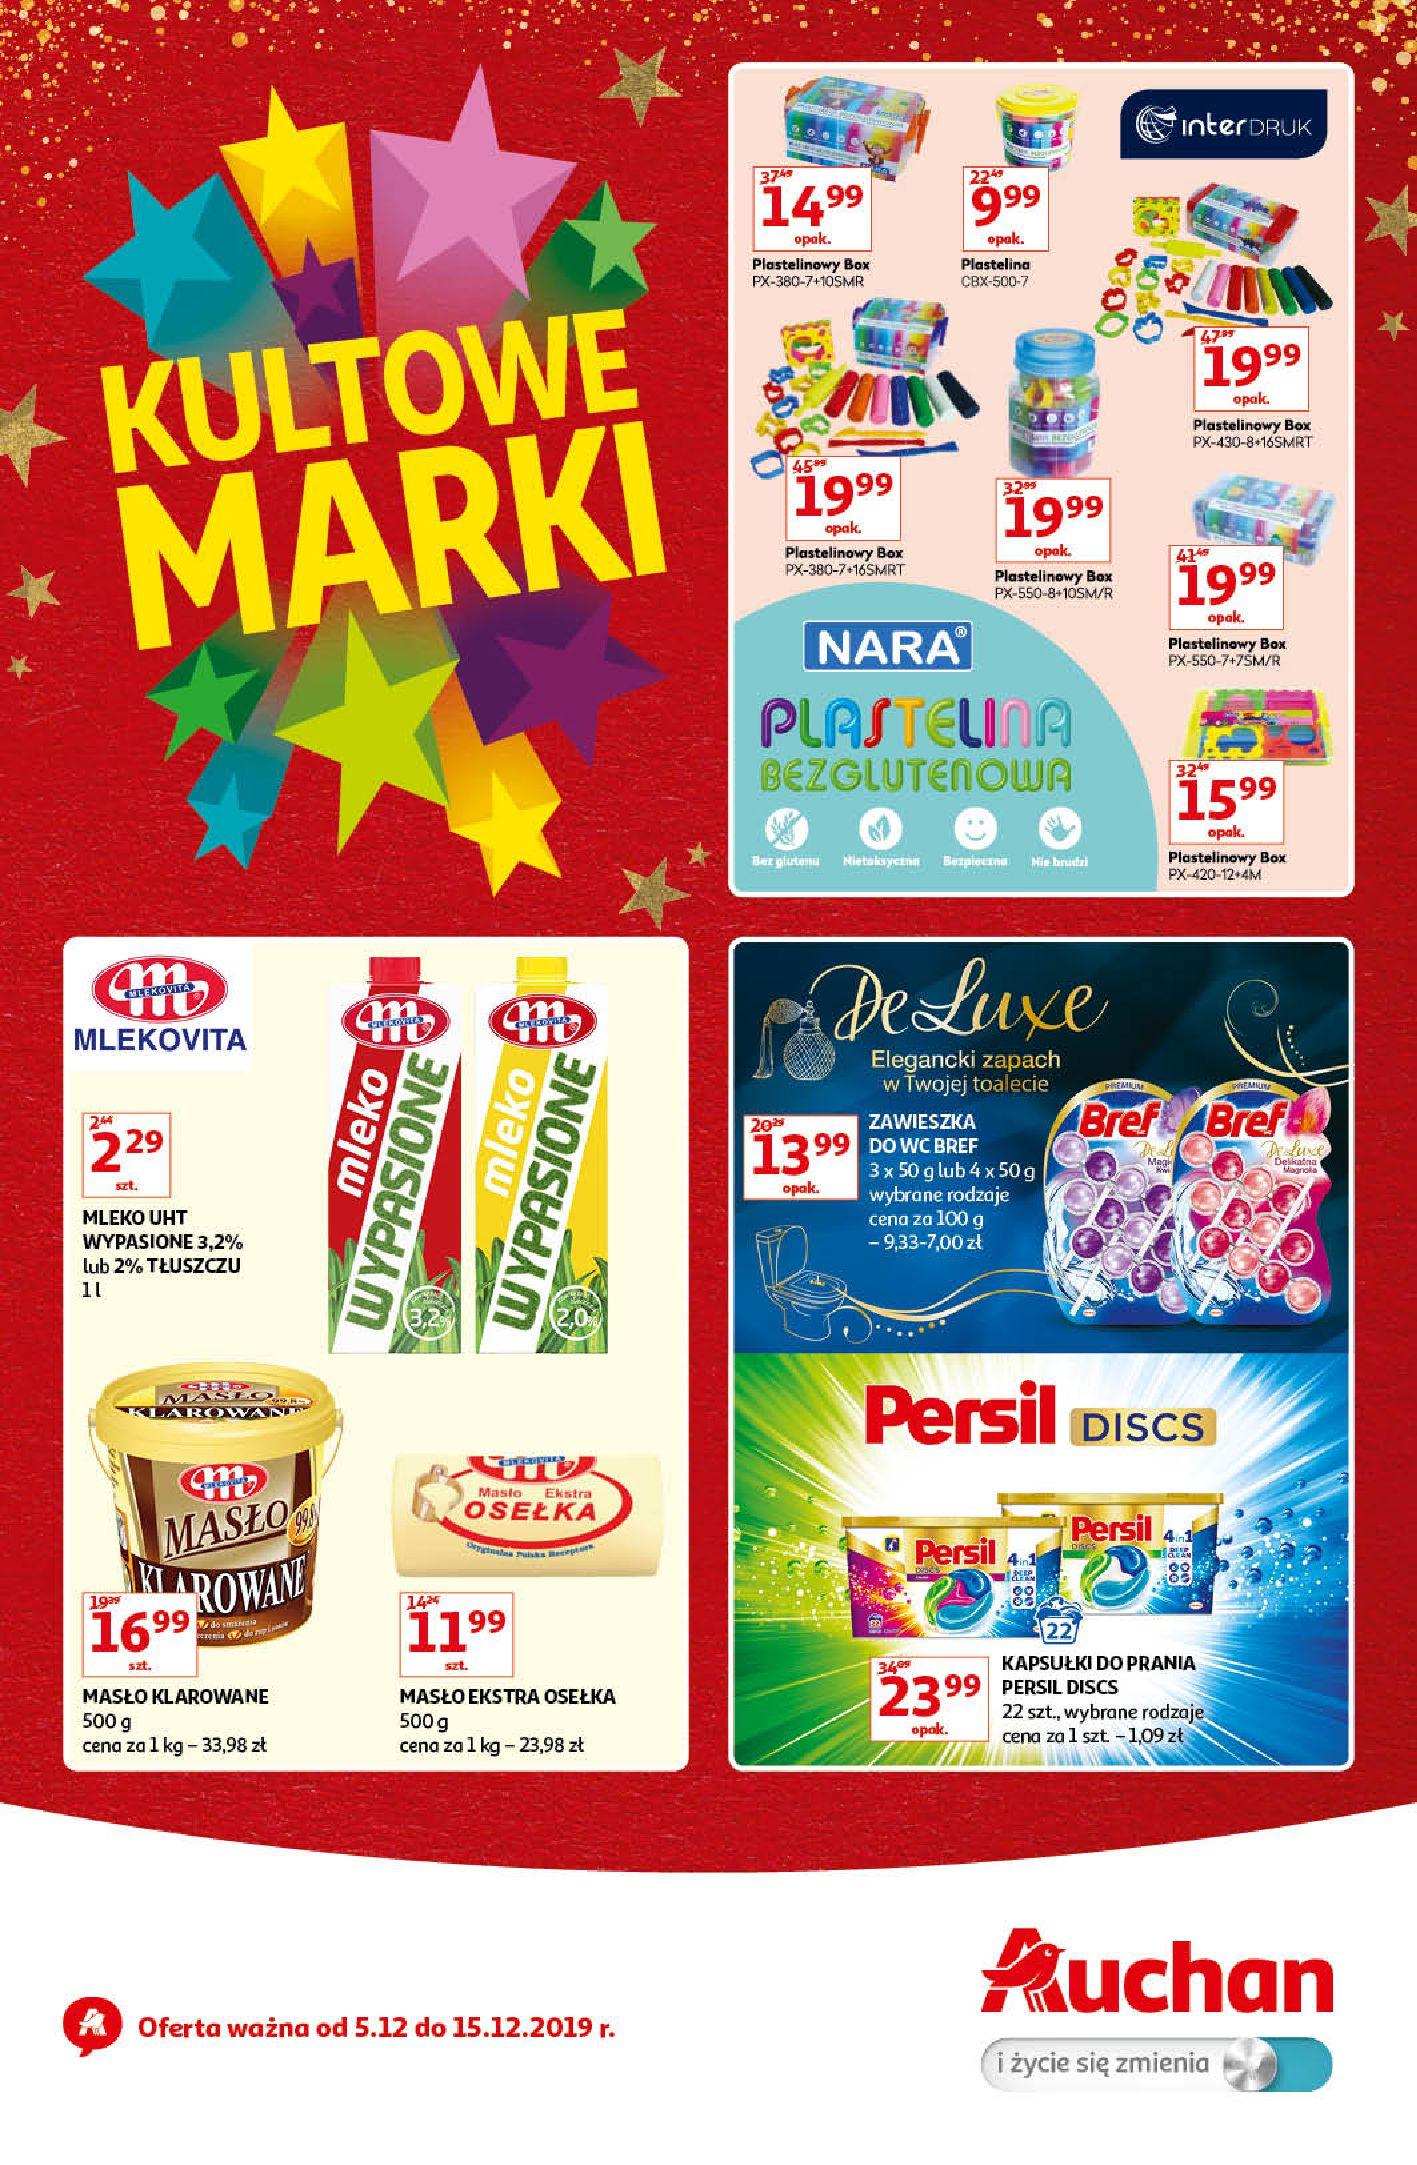 Gazetka Auchan - Kultowe Marki Hipermarkety-04.12.2019-15.12.2019-page-1